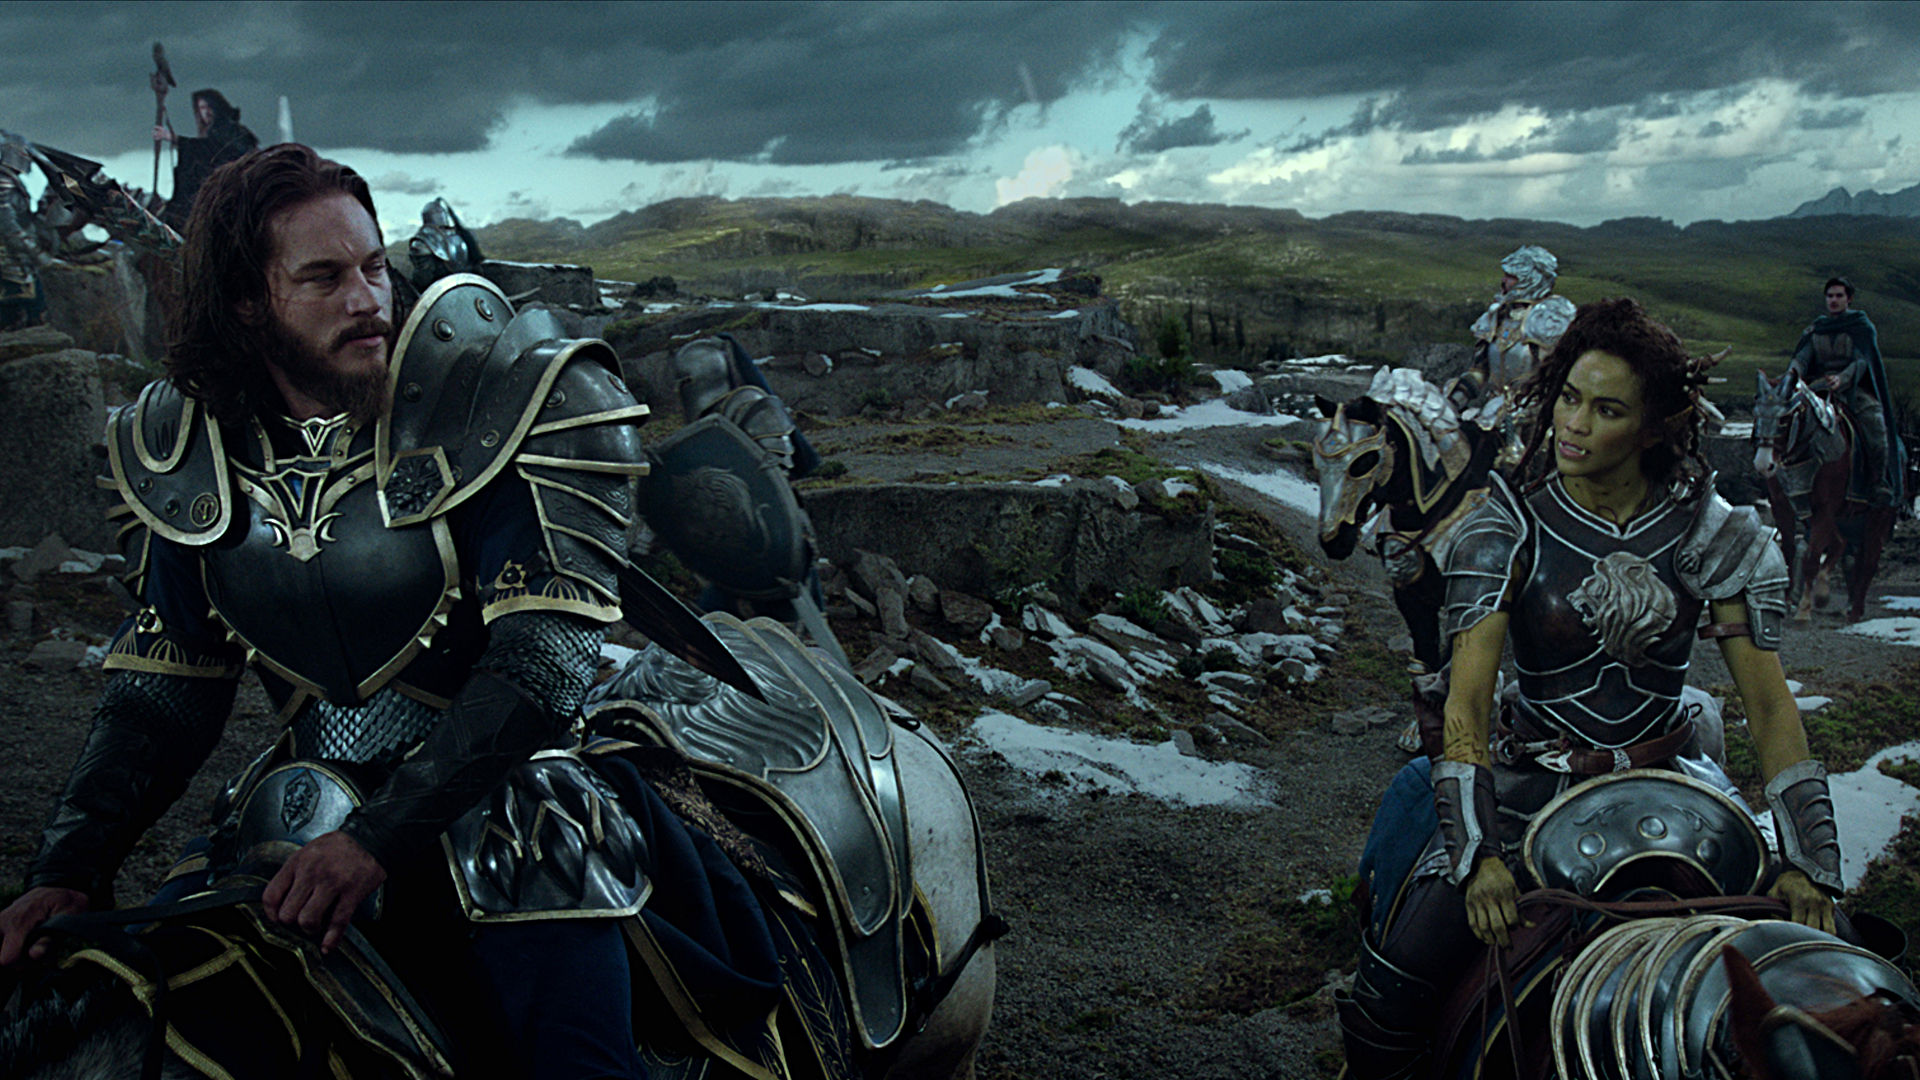 Warcraft HD pics